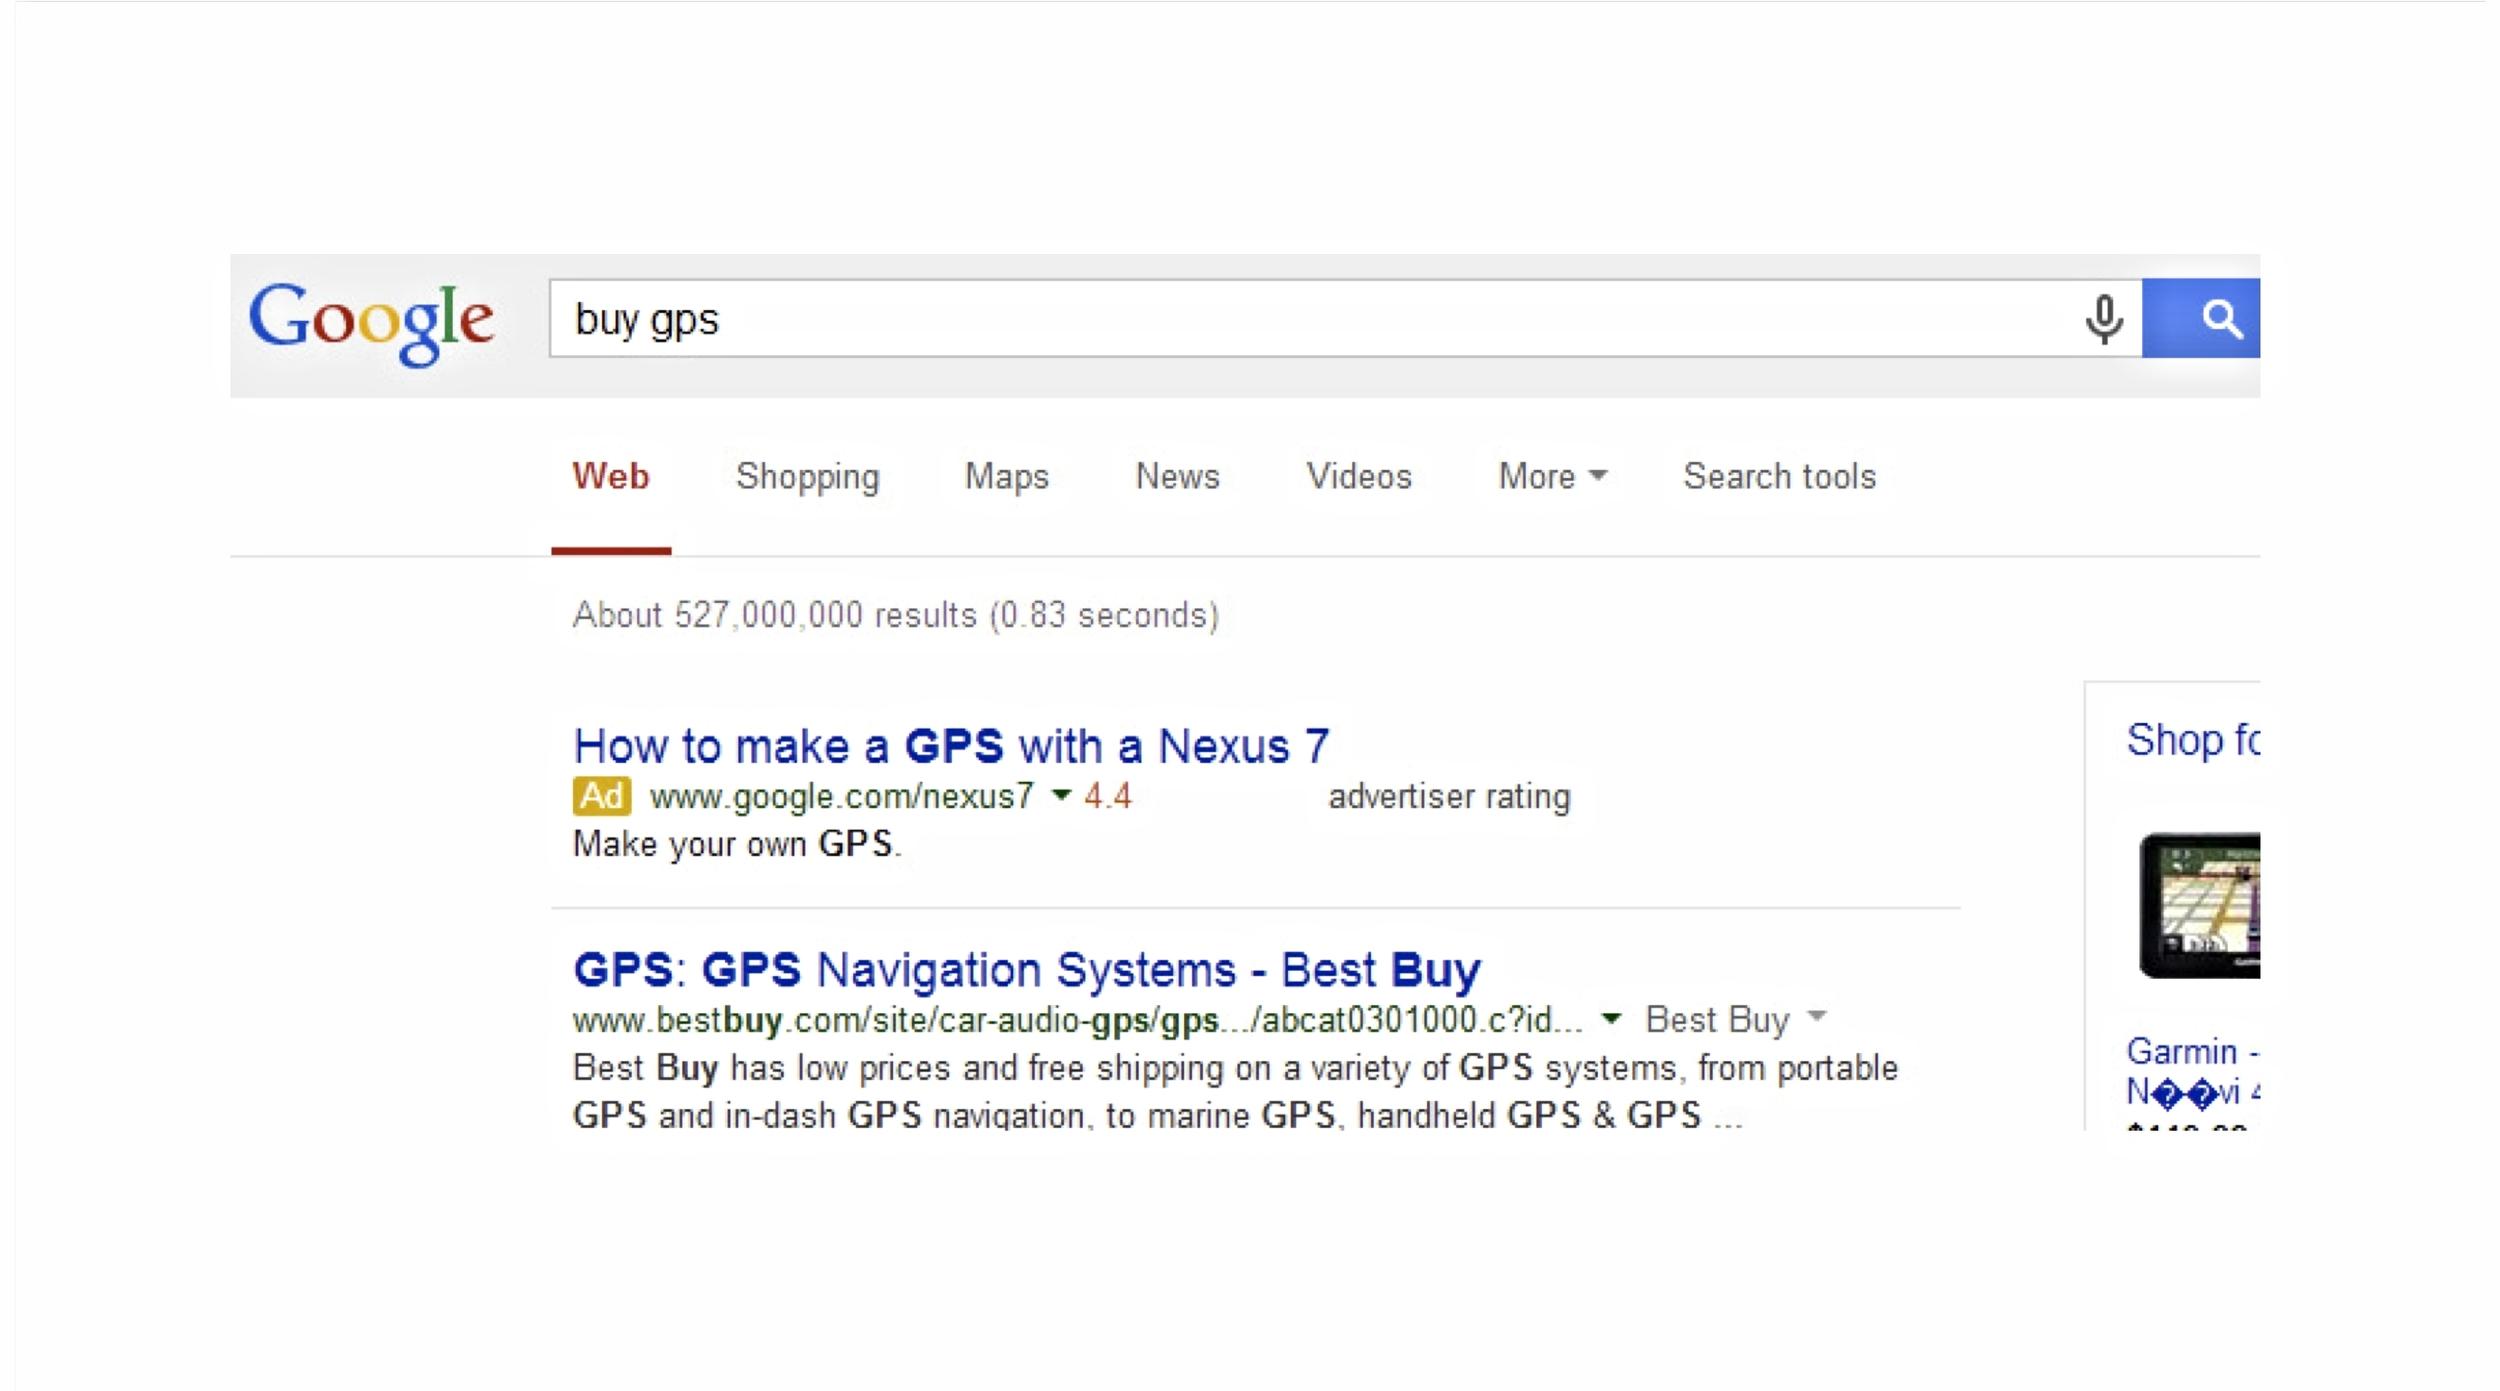 google ad 1.jpg